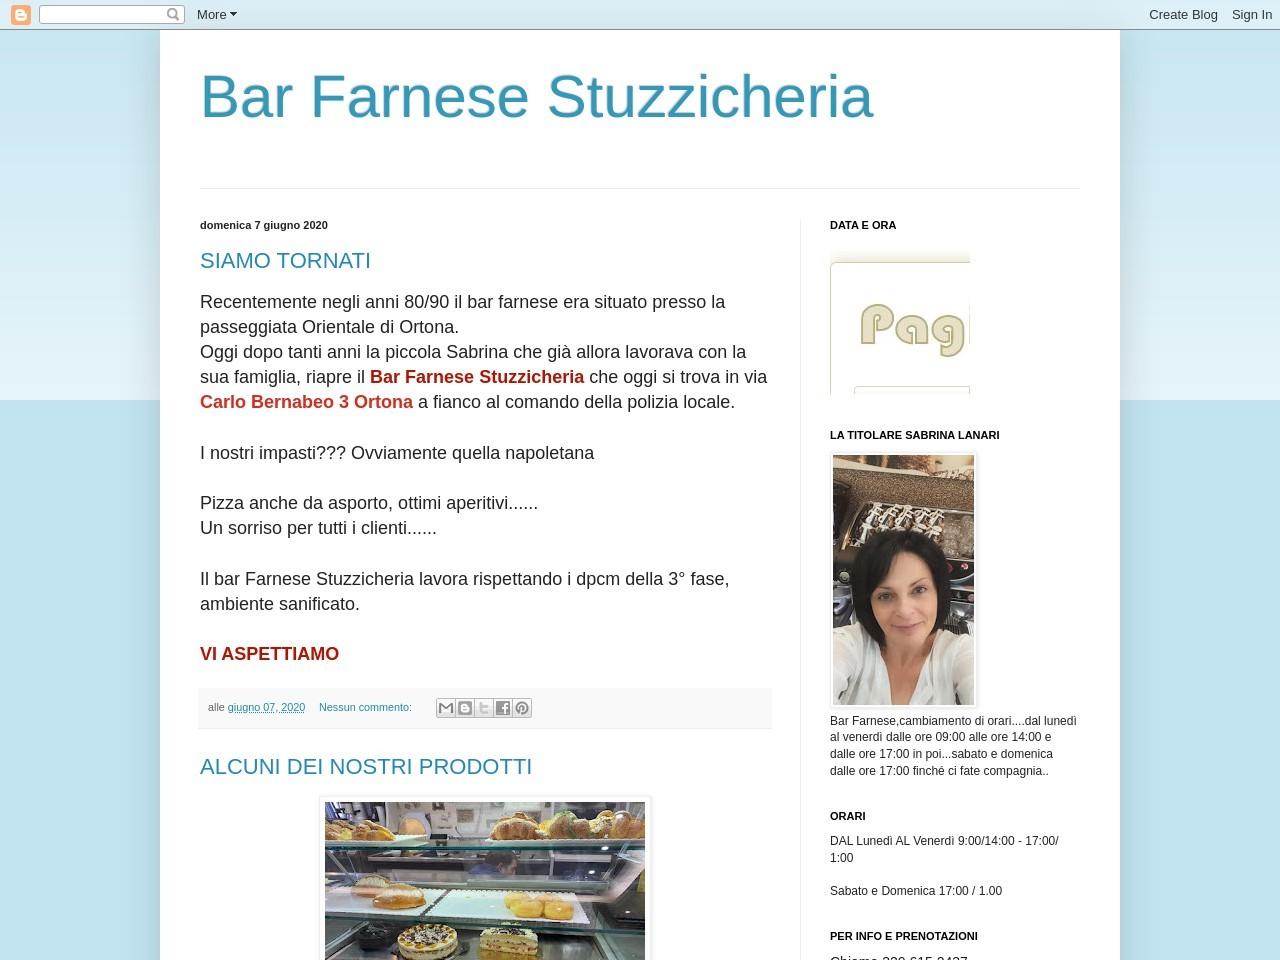 bar-farnese-stuzzicheria-ortona